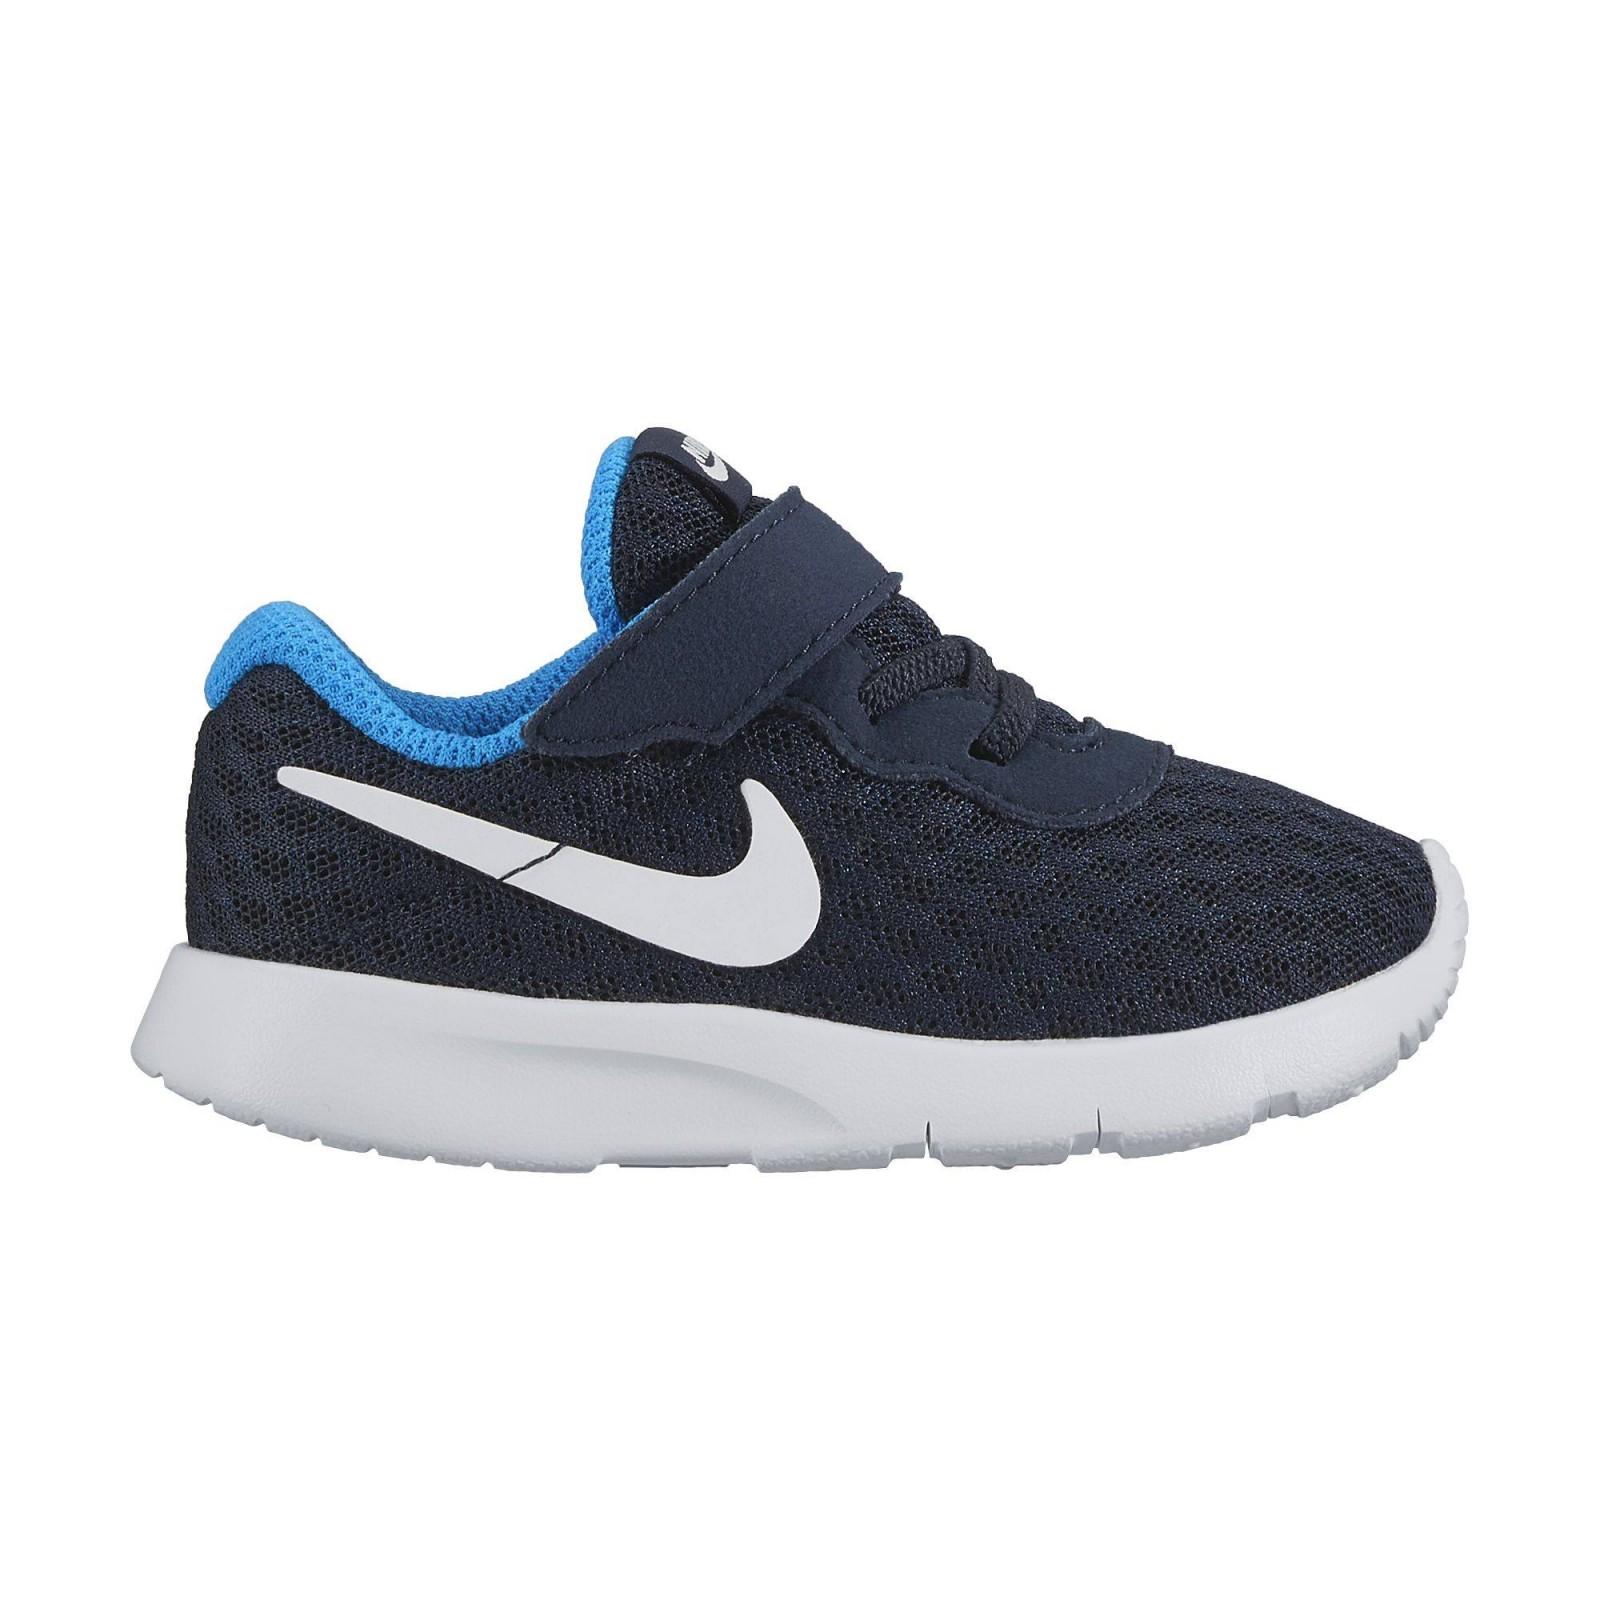 Dětské boty Nike TANJUN (TDV)  f7d74cd5cc